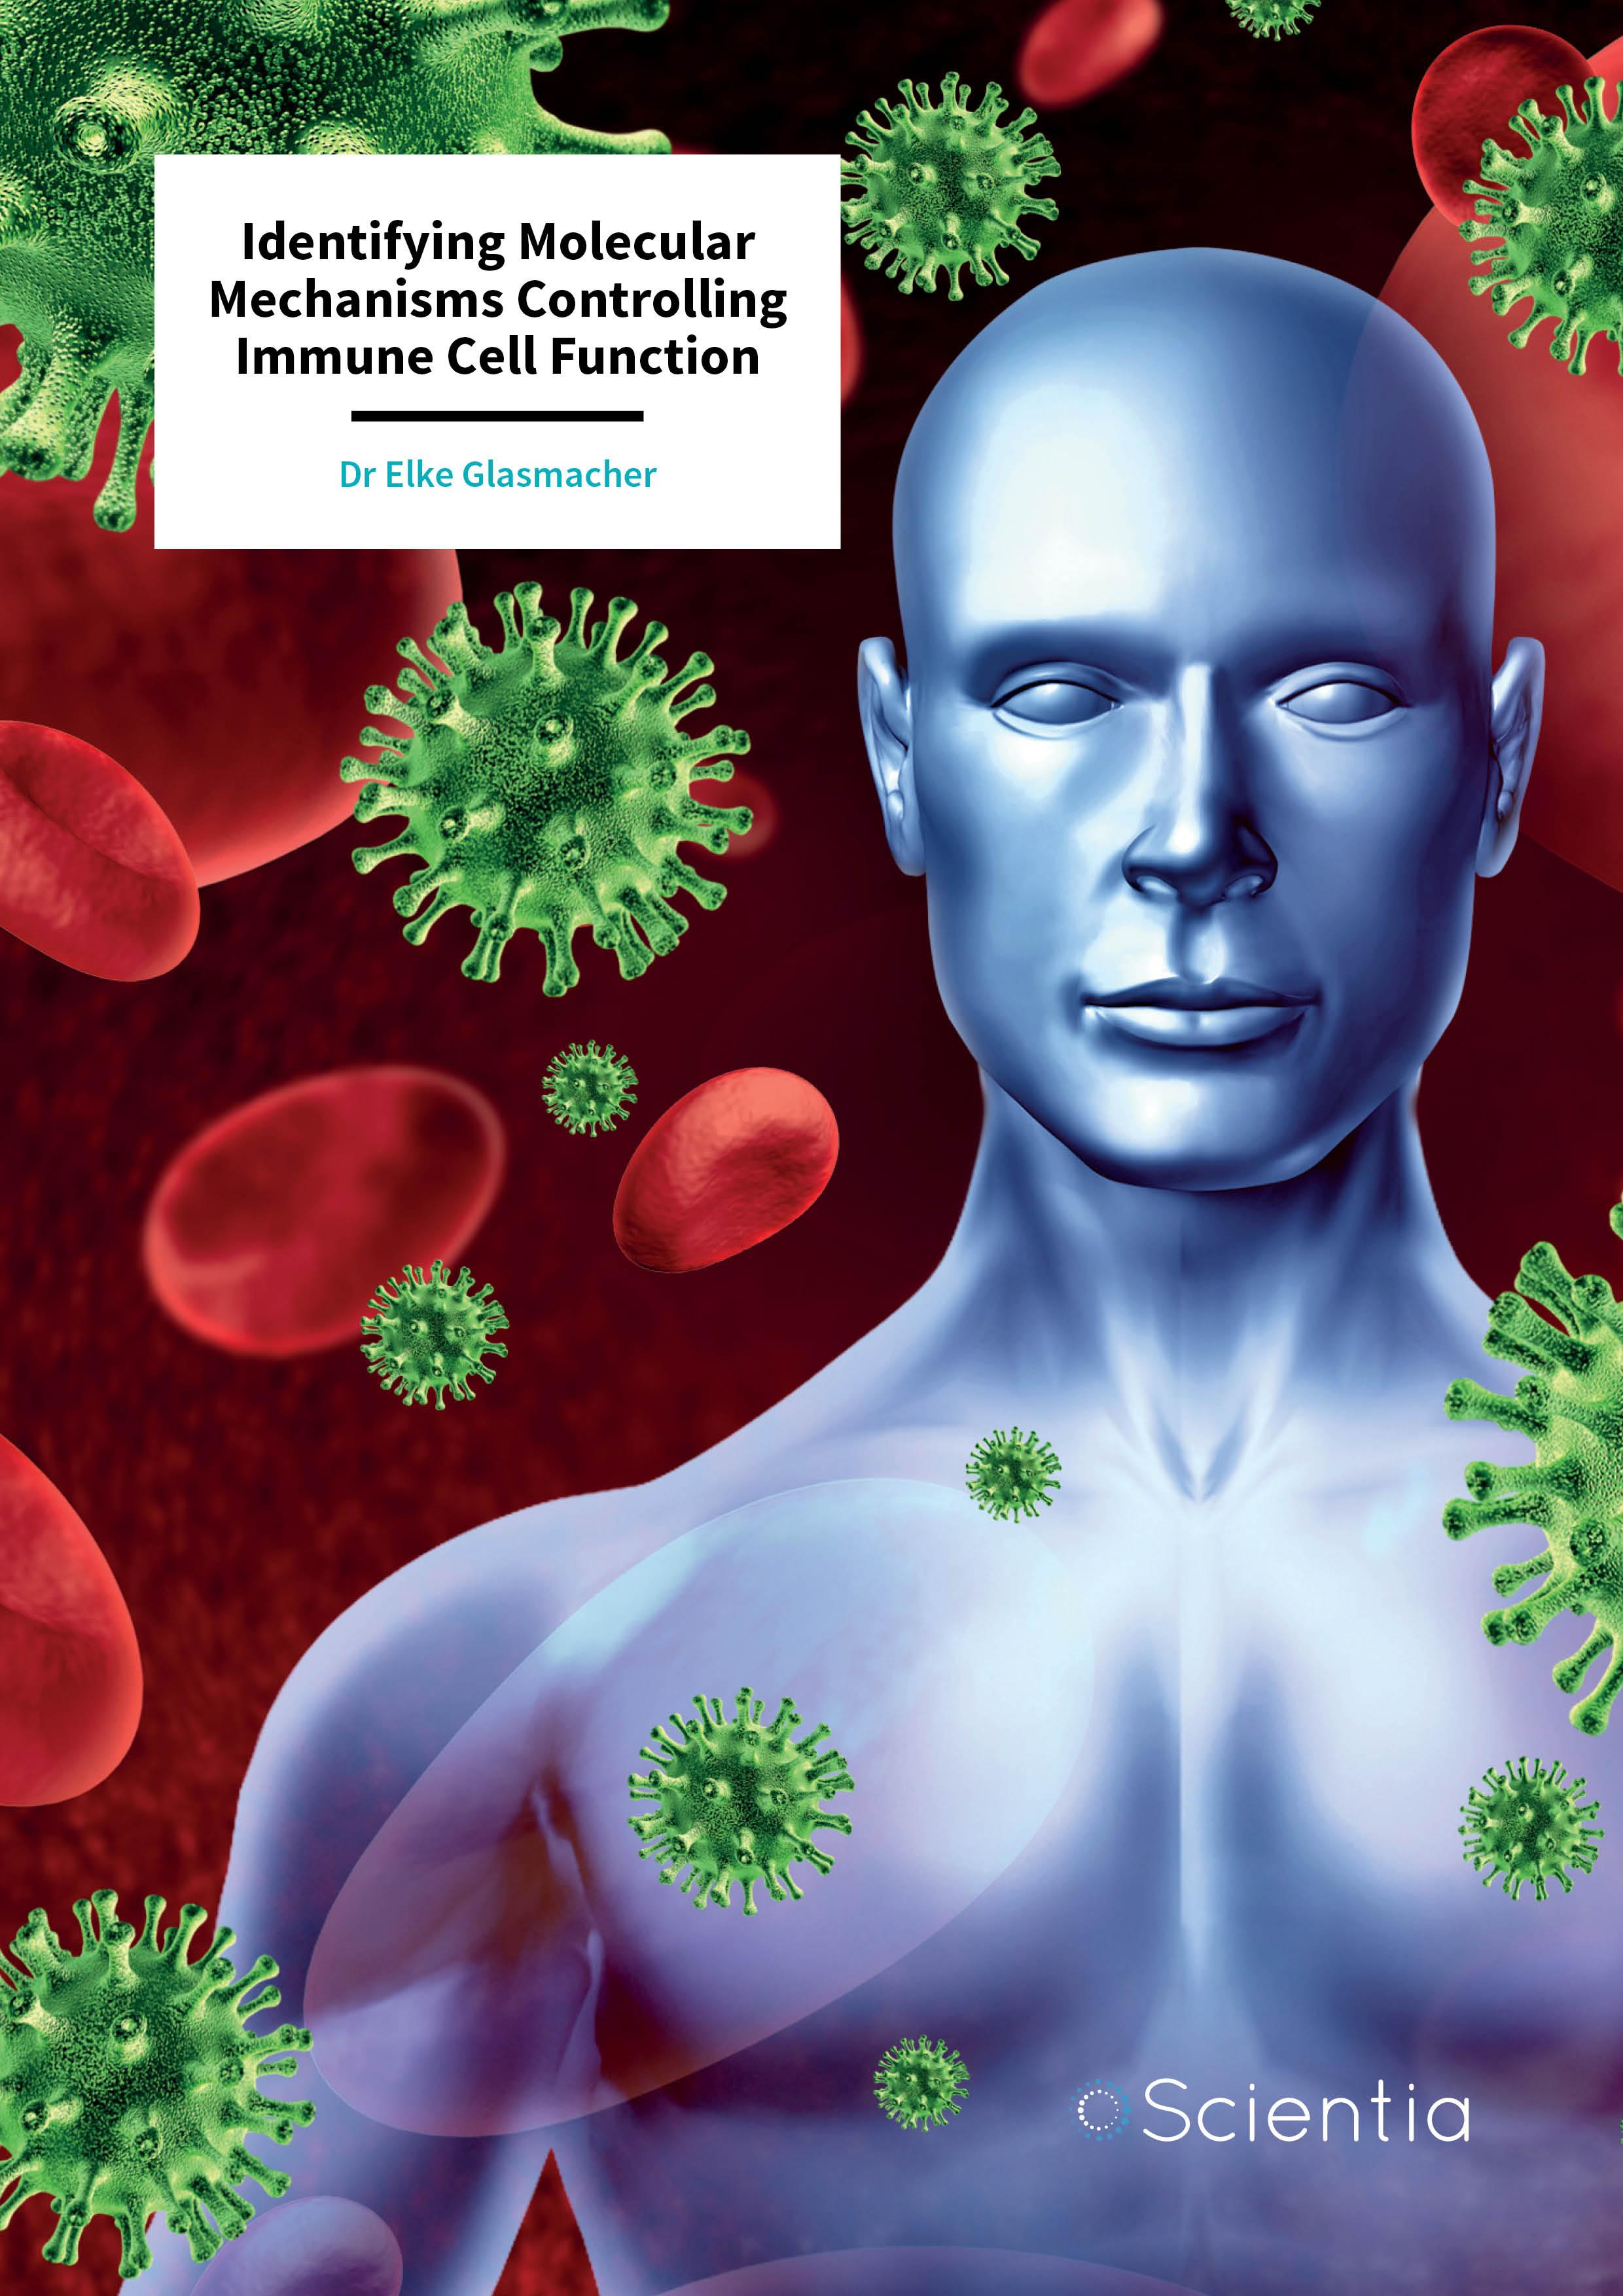 Dr Elke Glasmacher – Identifying Molecular Mechanisms Controlling Immune Cell Function